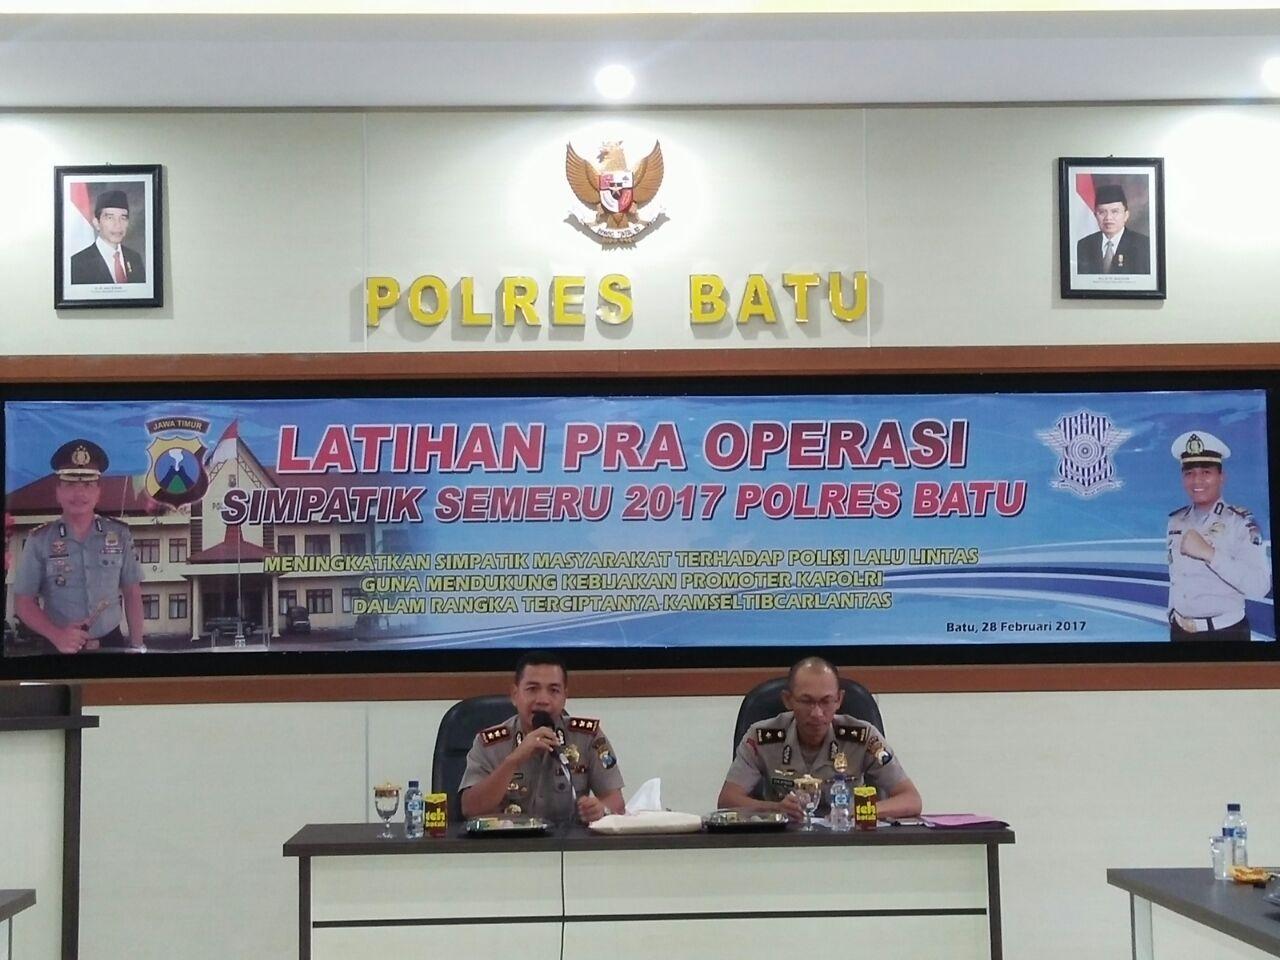 Latihan Pra Operasi Simpatik Semeru 2017 Polres Batu